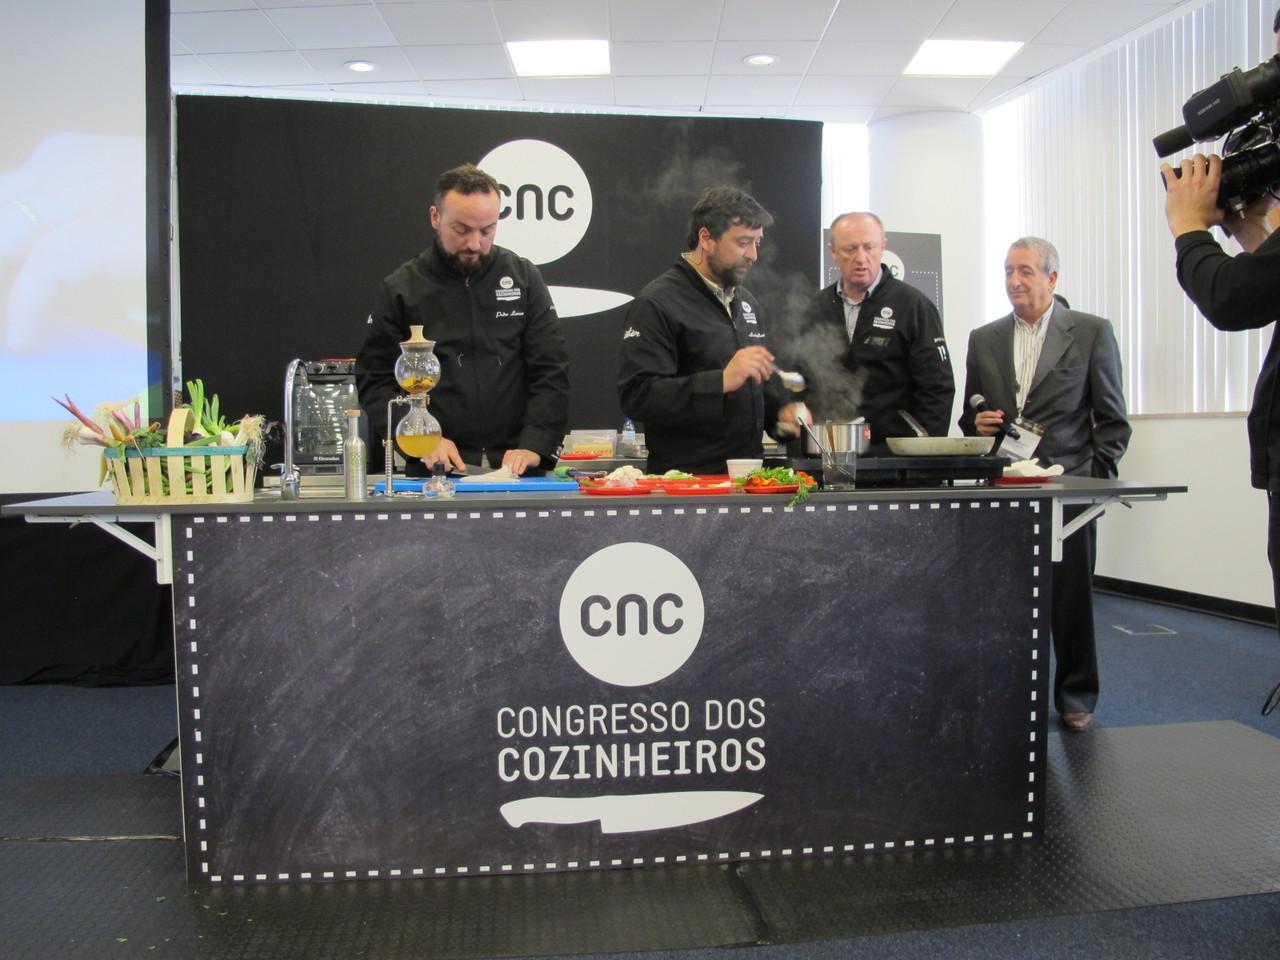 Pedro Lemos, Henrique Mouro, Tomasz Bazyl, Virgílio Gomes